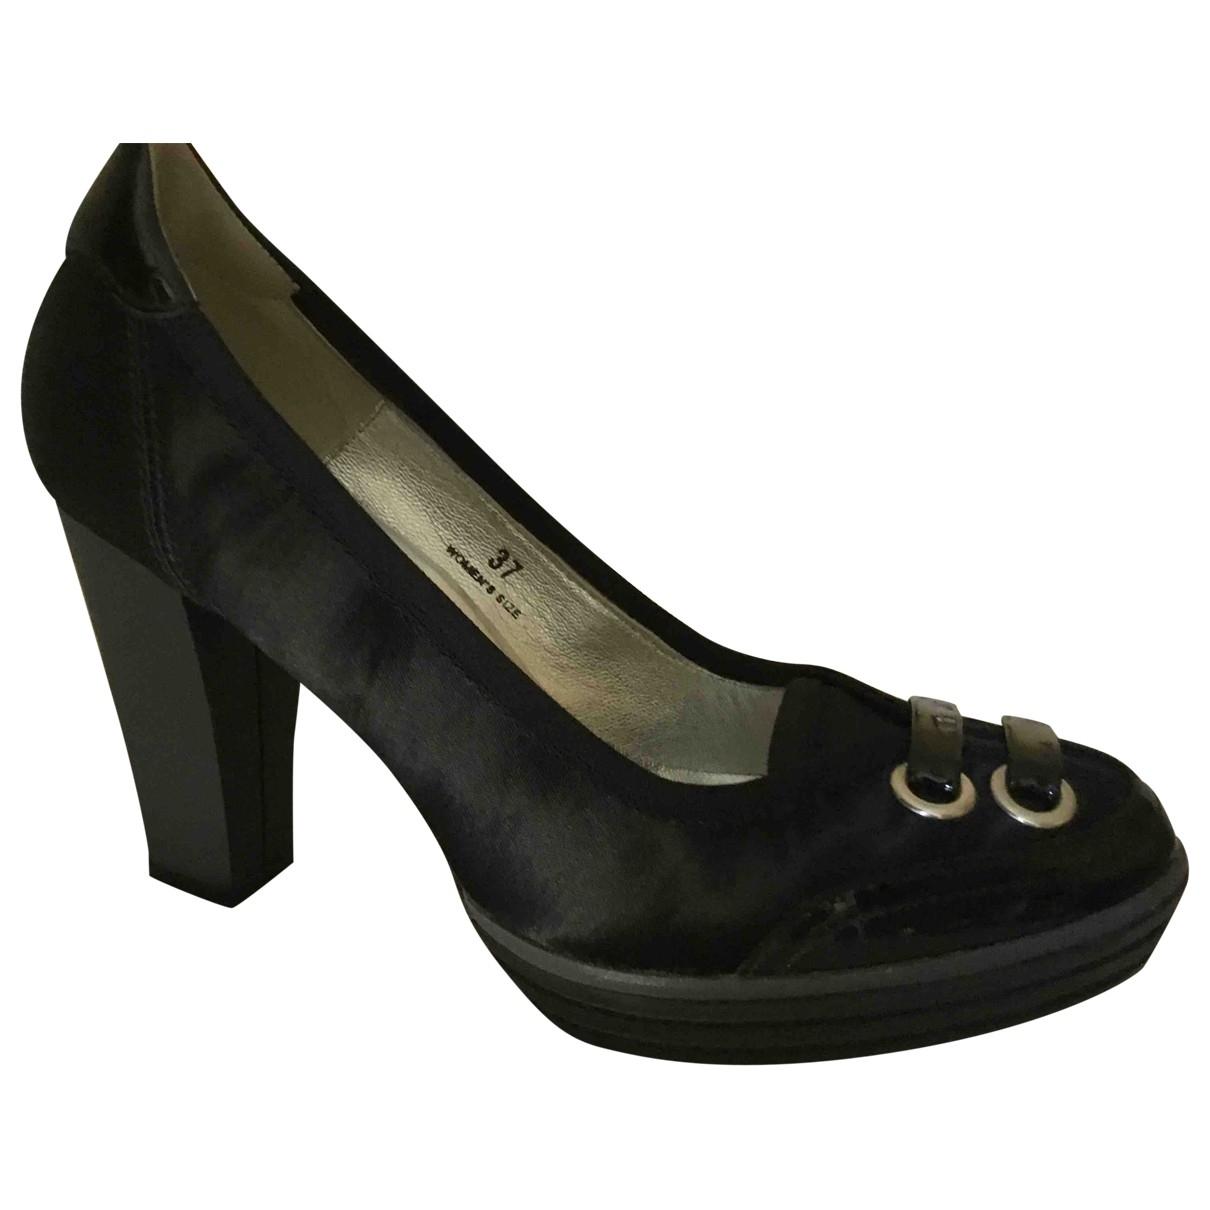 Hogan \N Black Patent leather Heels for Women 37 EU